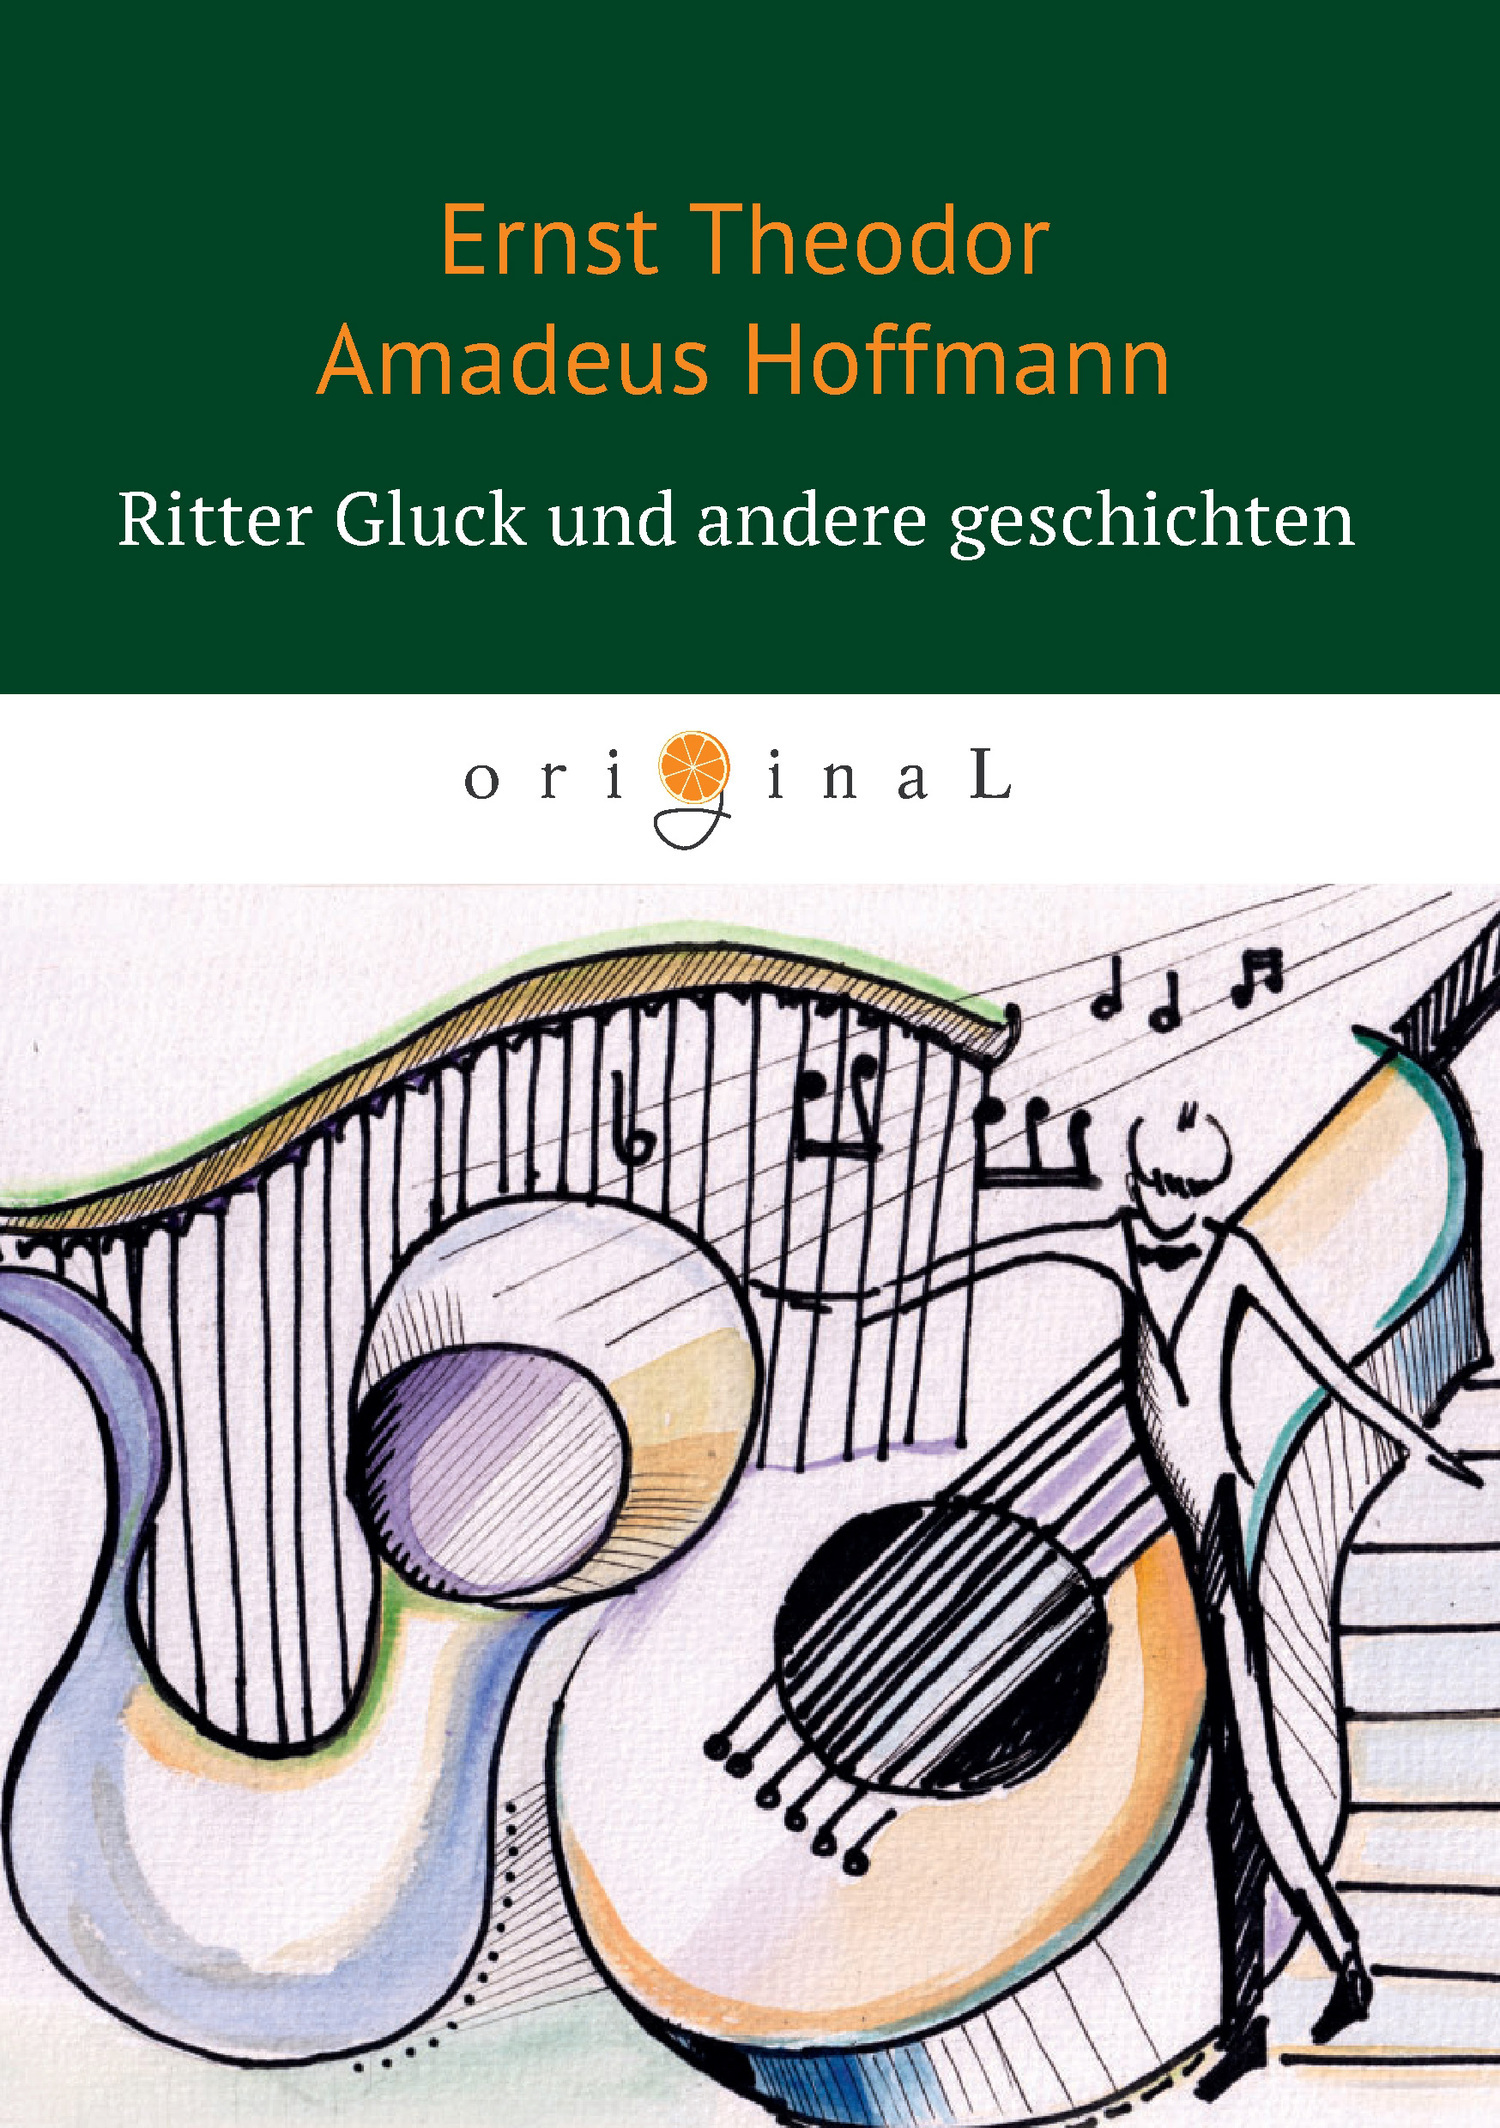 Эрнст Гофман Ritter Gluck und andere Geschichten сапоги quelle der spur 1013540